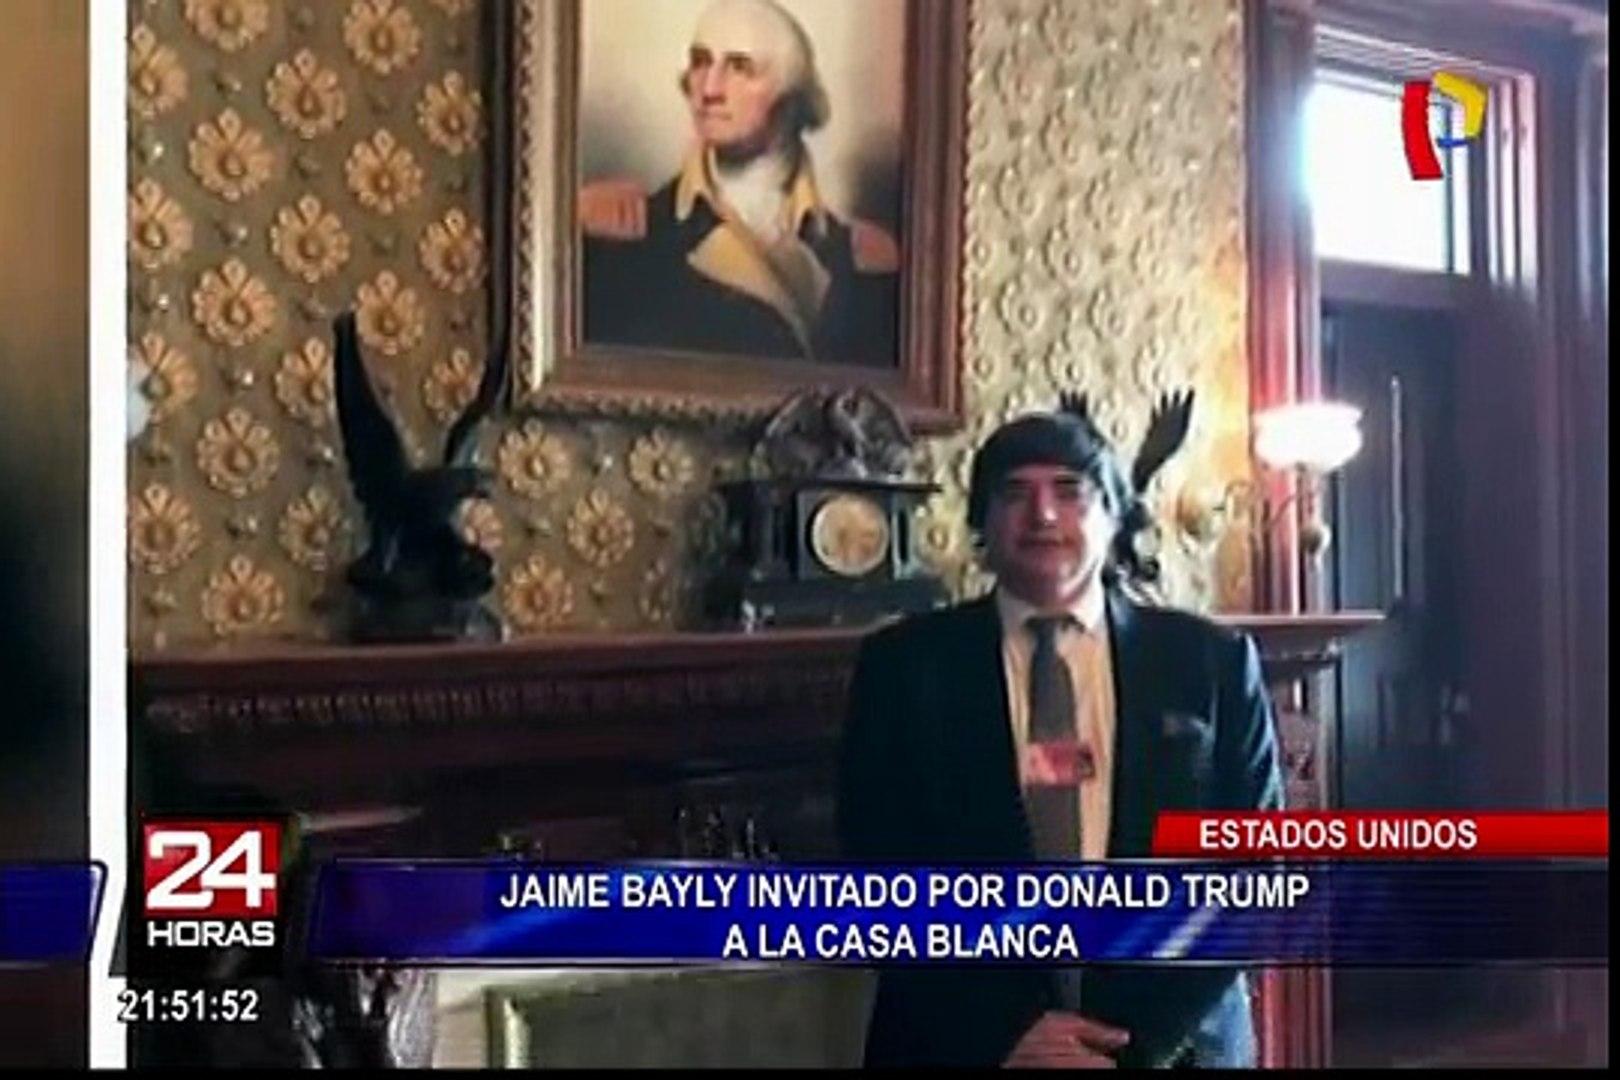 Eeuu Donald Trump Invito A Jaime Bayly A La Casa Blanca Video Dailymotion Su trayectoria televisiva comenzó en 1983, como entrevistador de celebridades y políticos. eeuu donald trump invito a jaime bayly